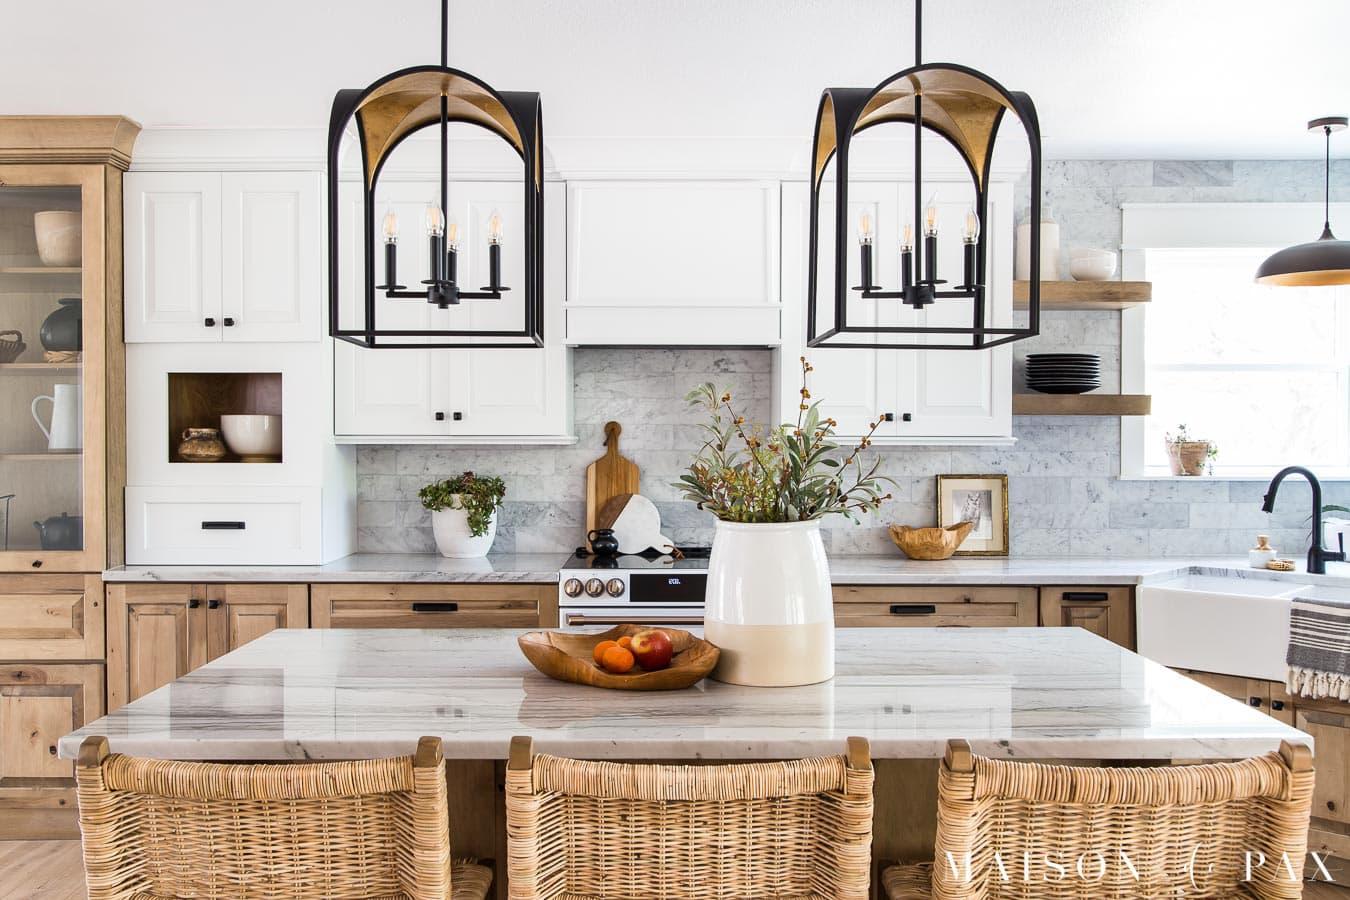 black and gold lantern pendant lighting above kitchen island | Maison de Pax